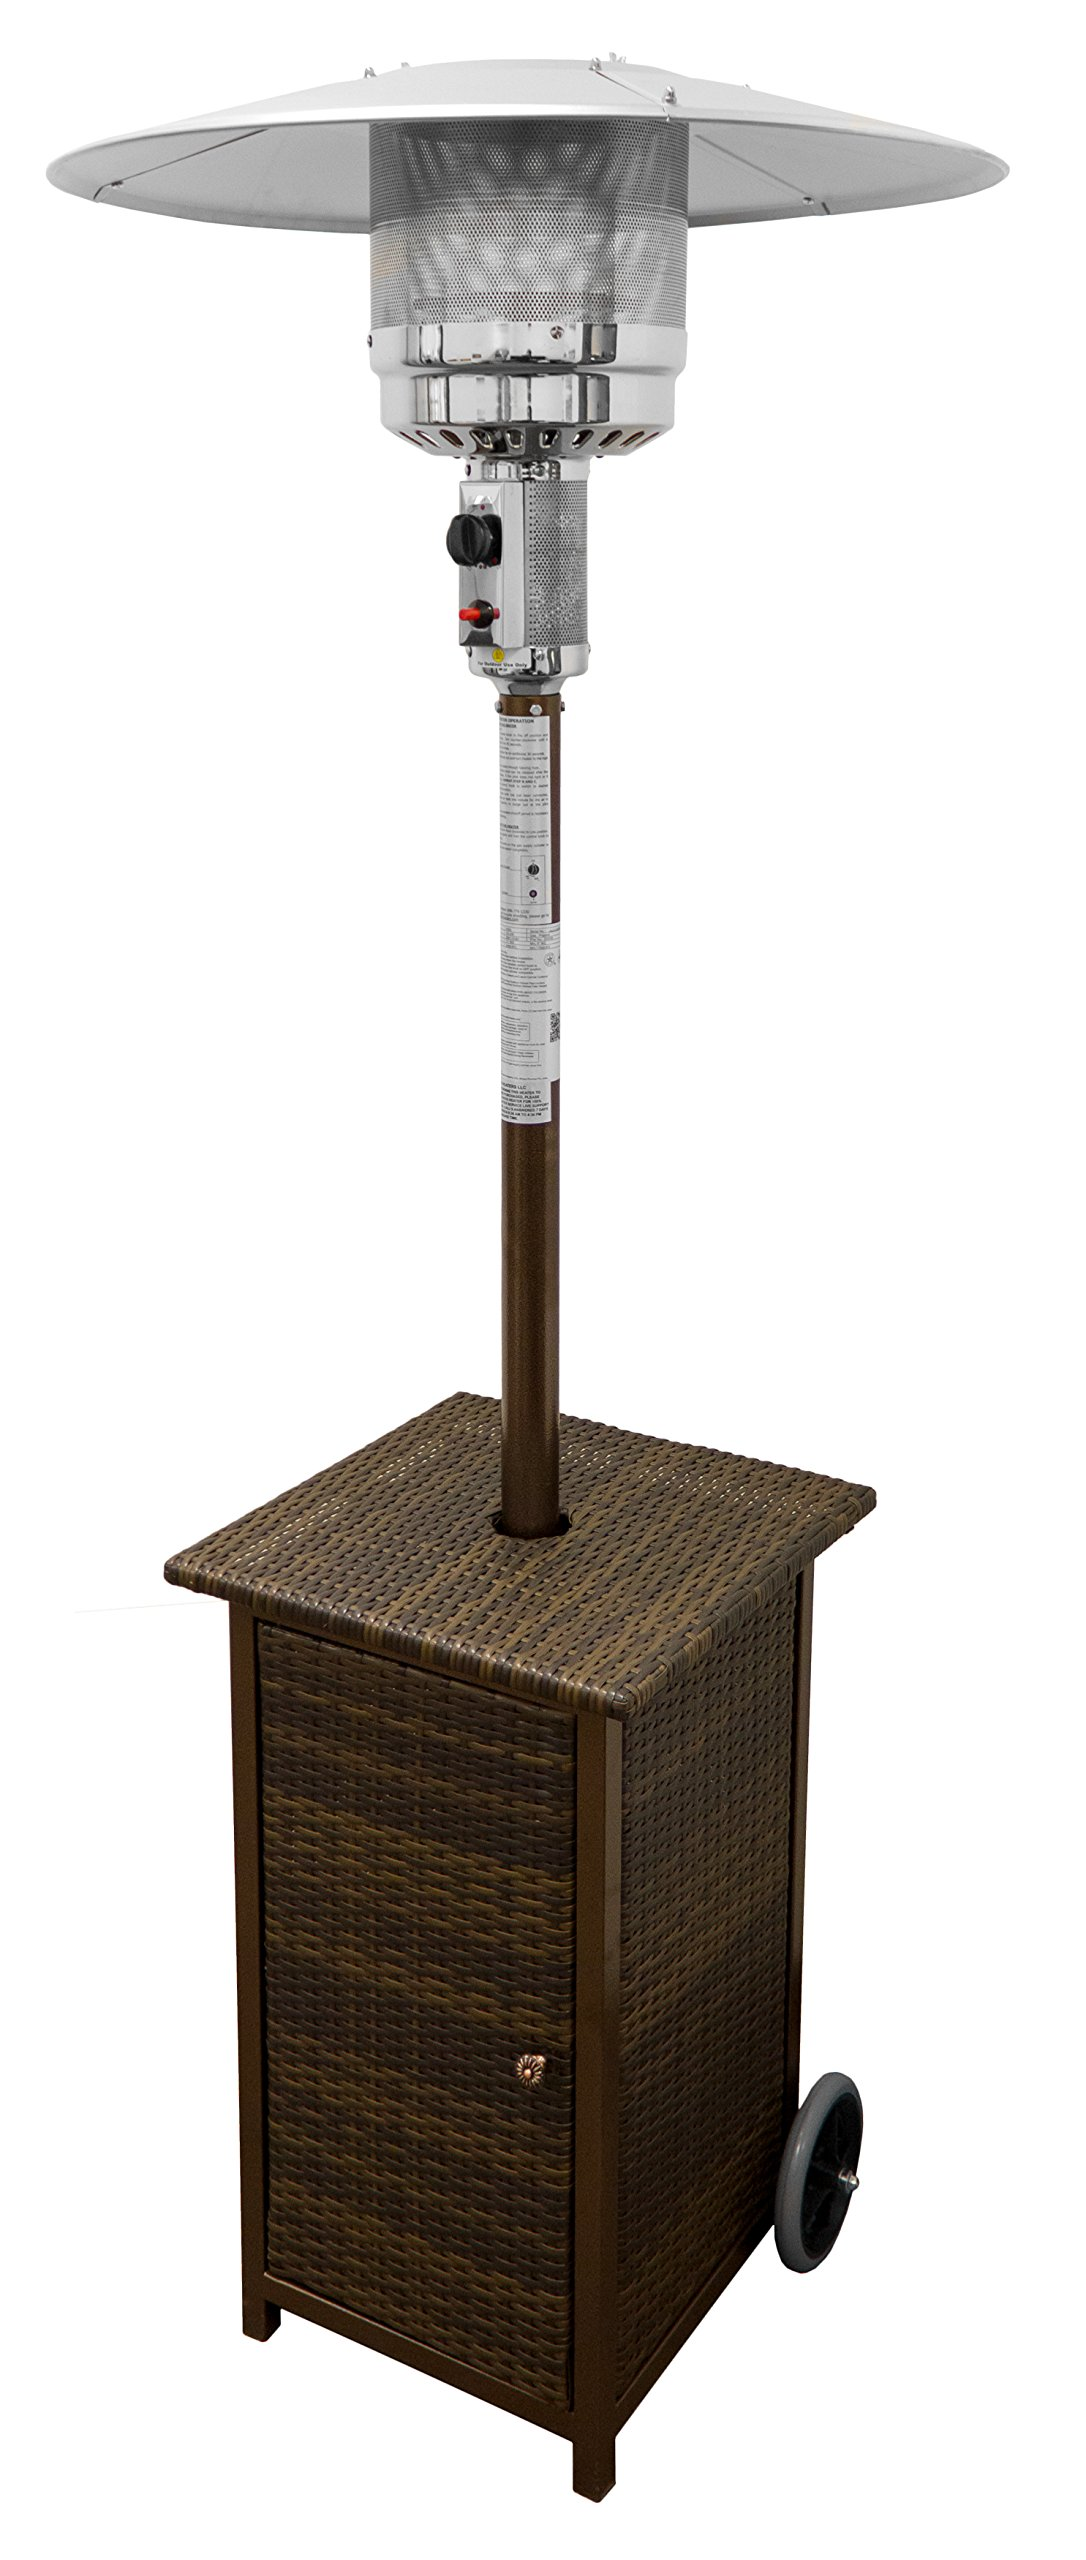 Hiland HLDS01-WHSQ Tall Square Wicker Propane Patio Heater with Wheels, 48,000 BTU, 33'' Heat Shield, Wicker by Hiland